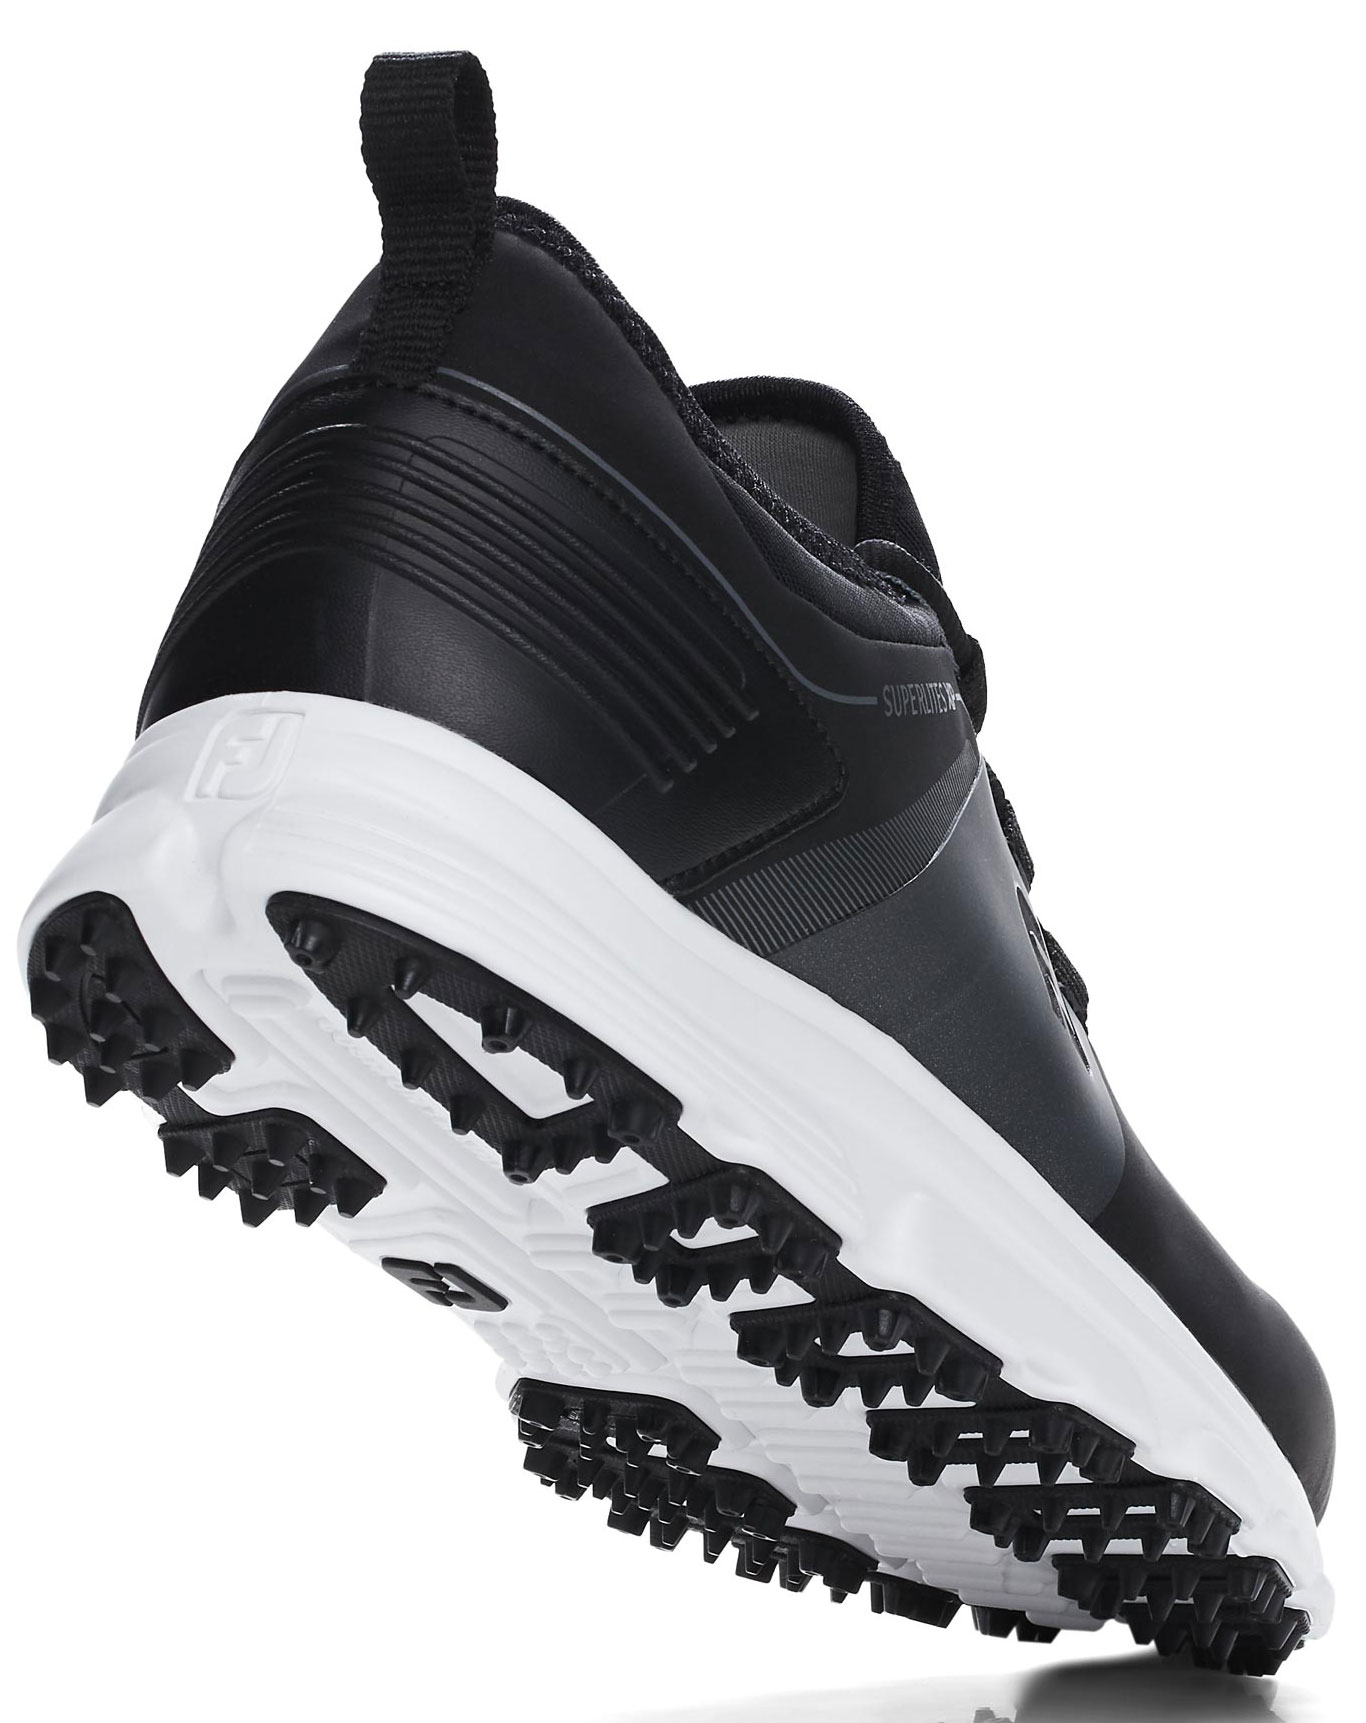 FootJoy-Superlites-XP-Golf-Shoes-Men-039-s-New thumbnail 3